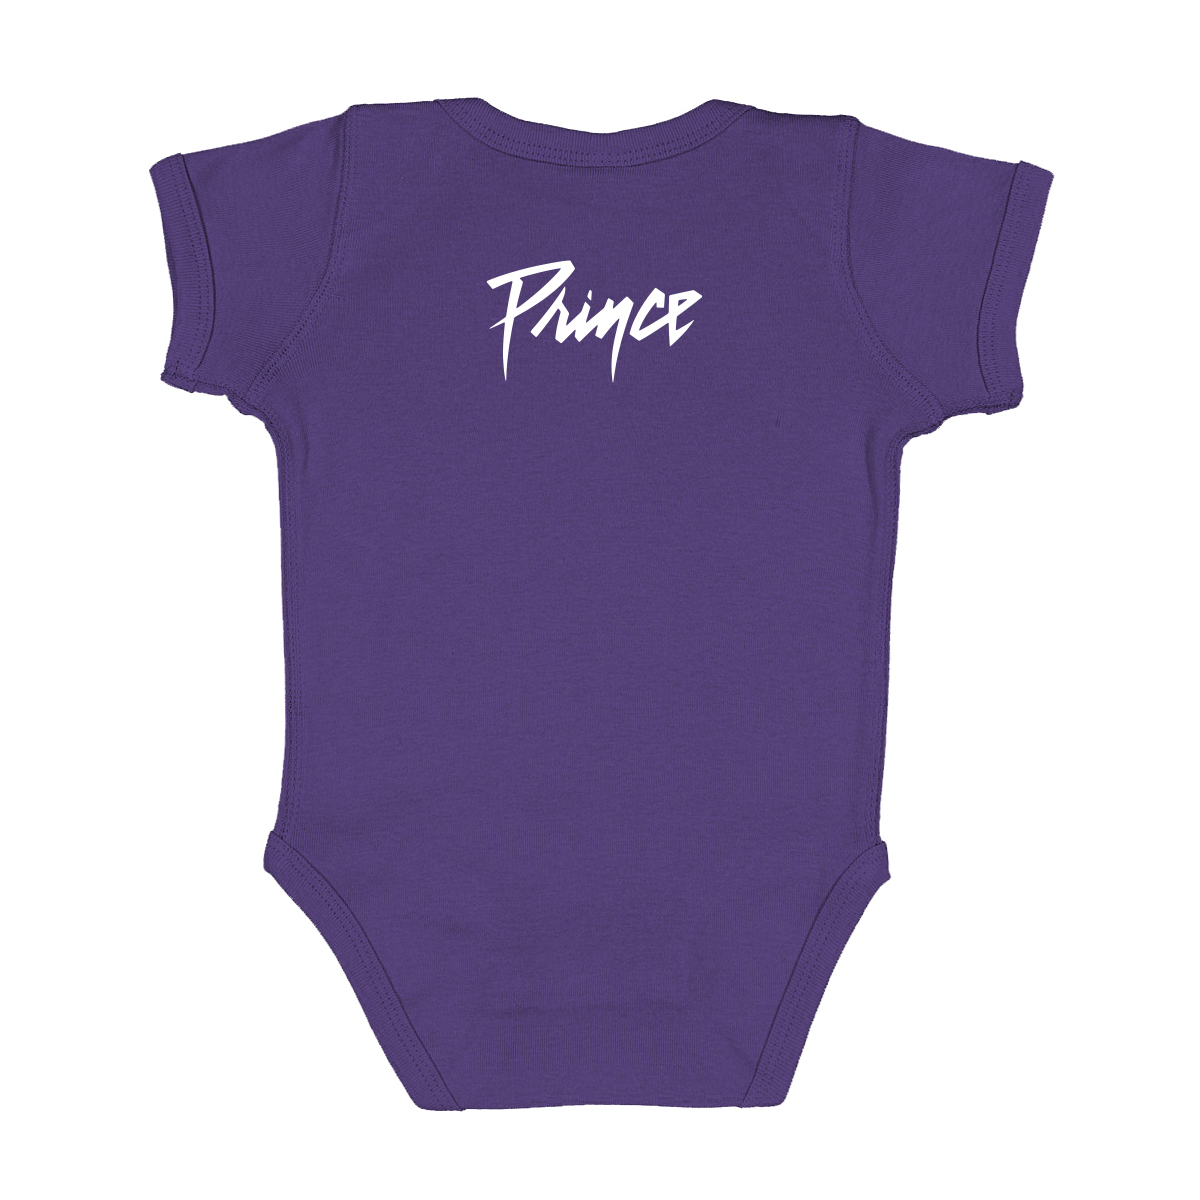 Prince Symbol Infant Onesie